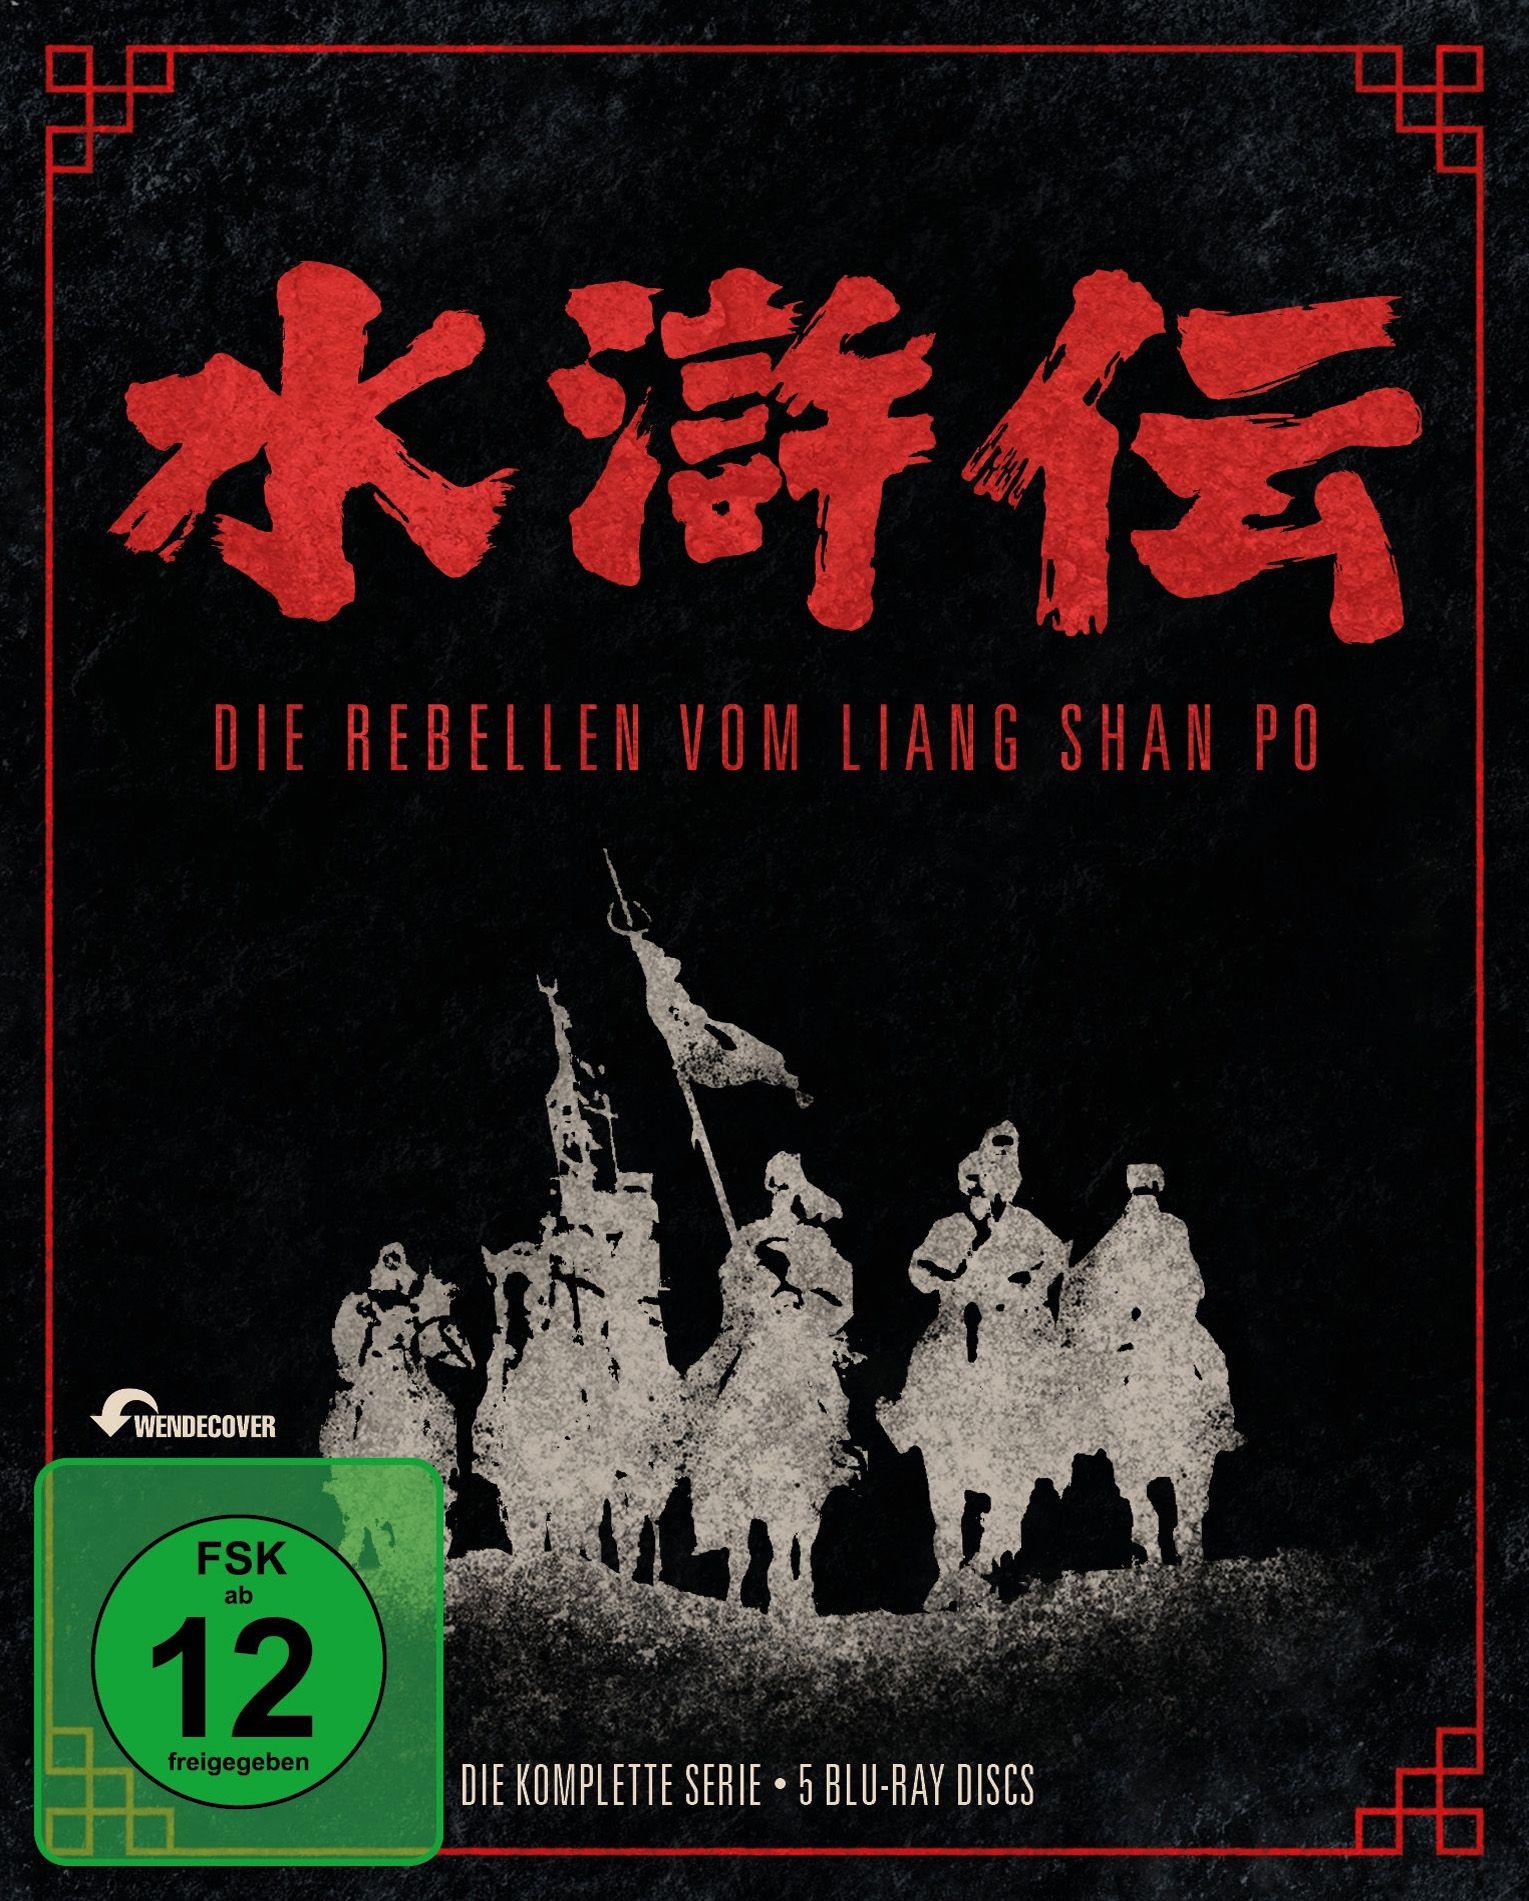 Rebellen vom Liang Shan Po, Die - Die komplette Serie (5 Discs) (BLURAY)